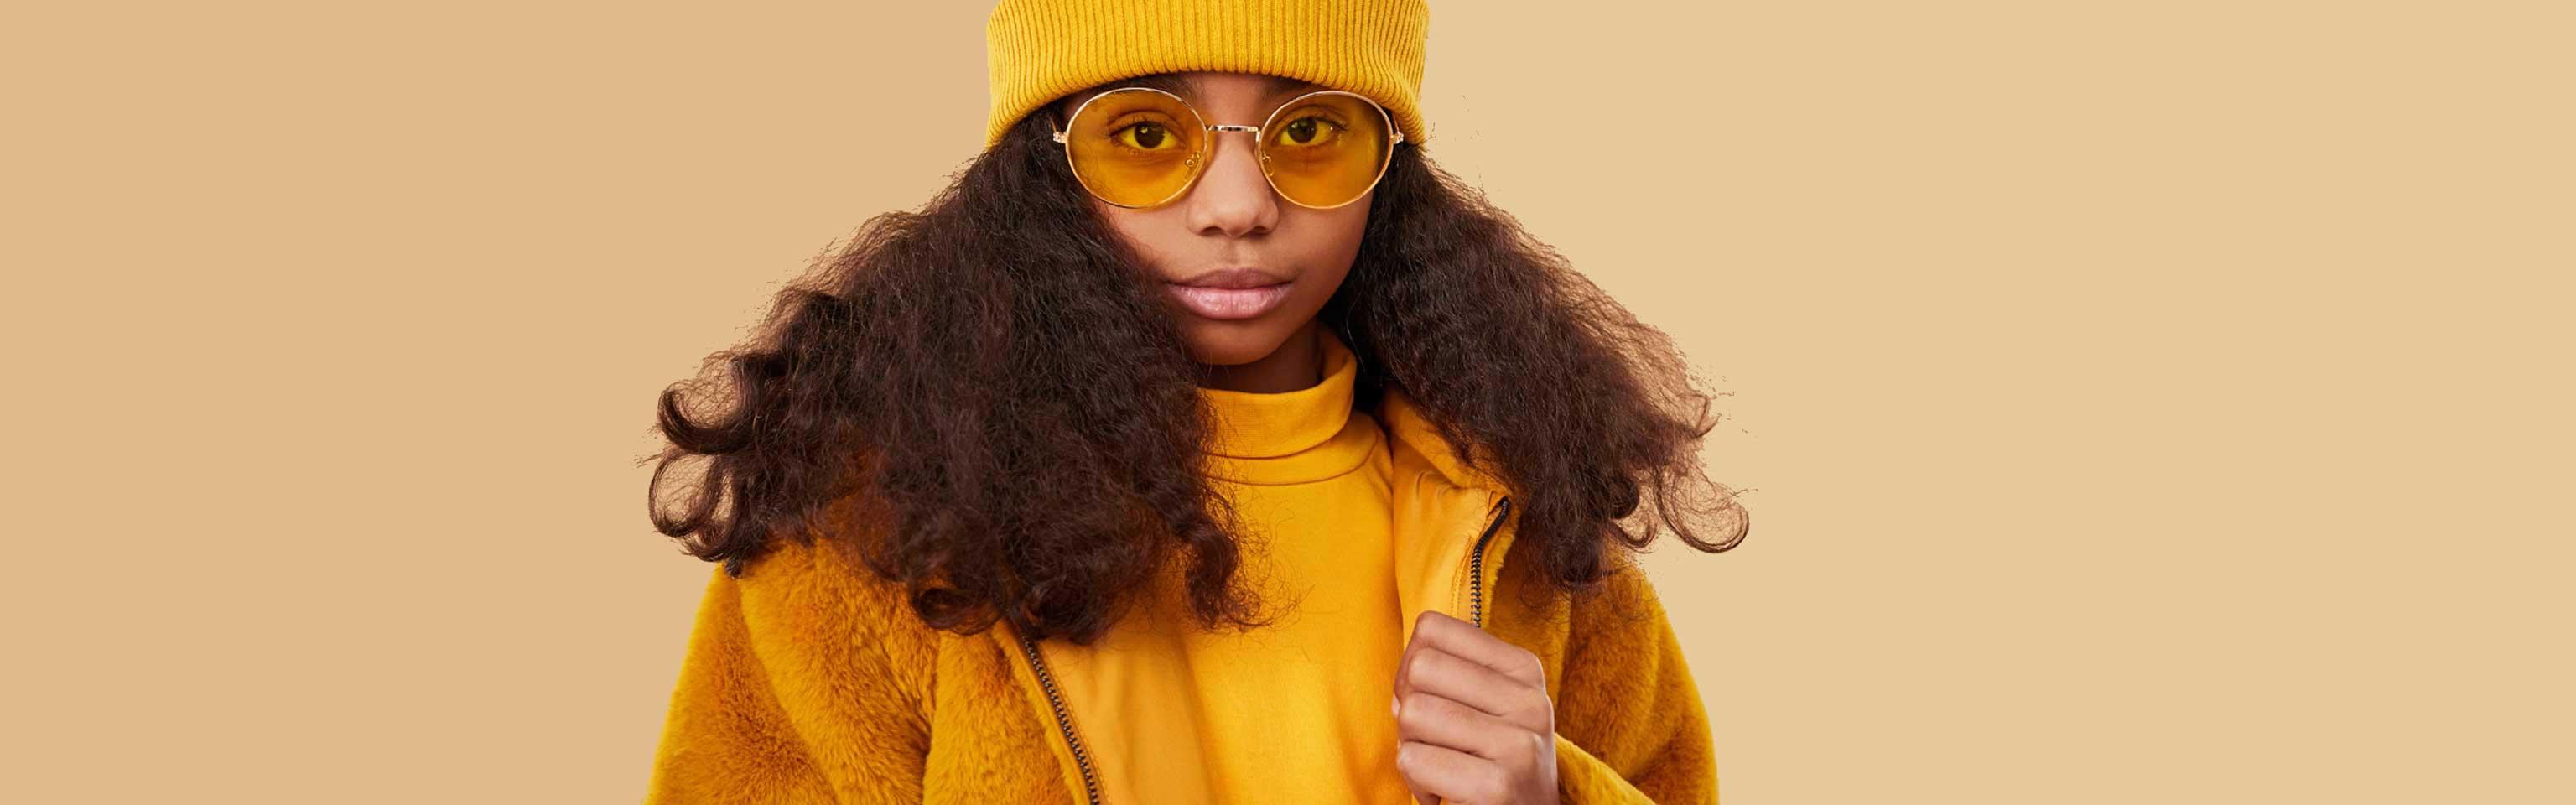 Black-Owned Girls' Clothing